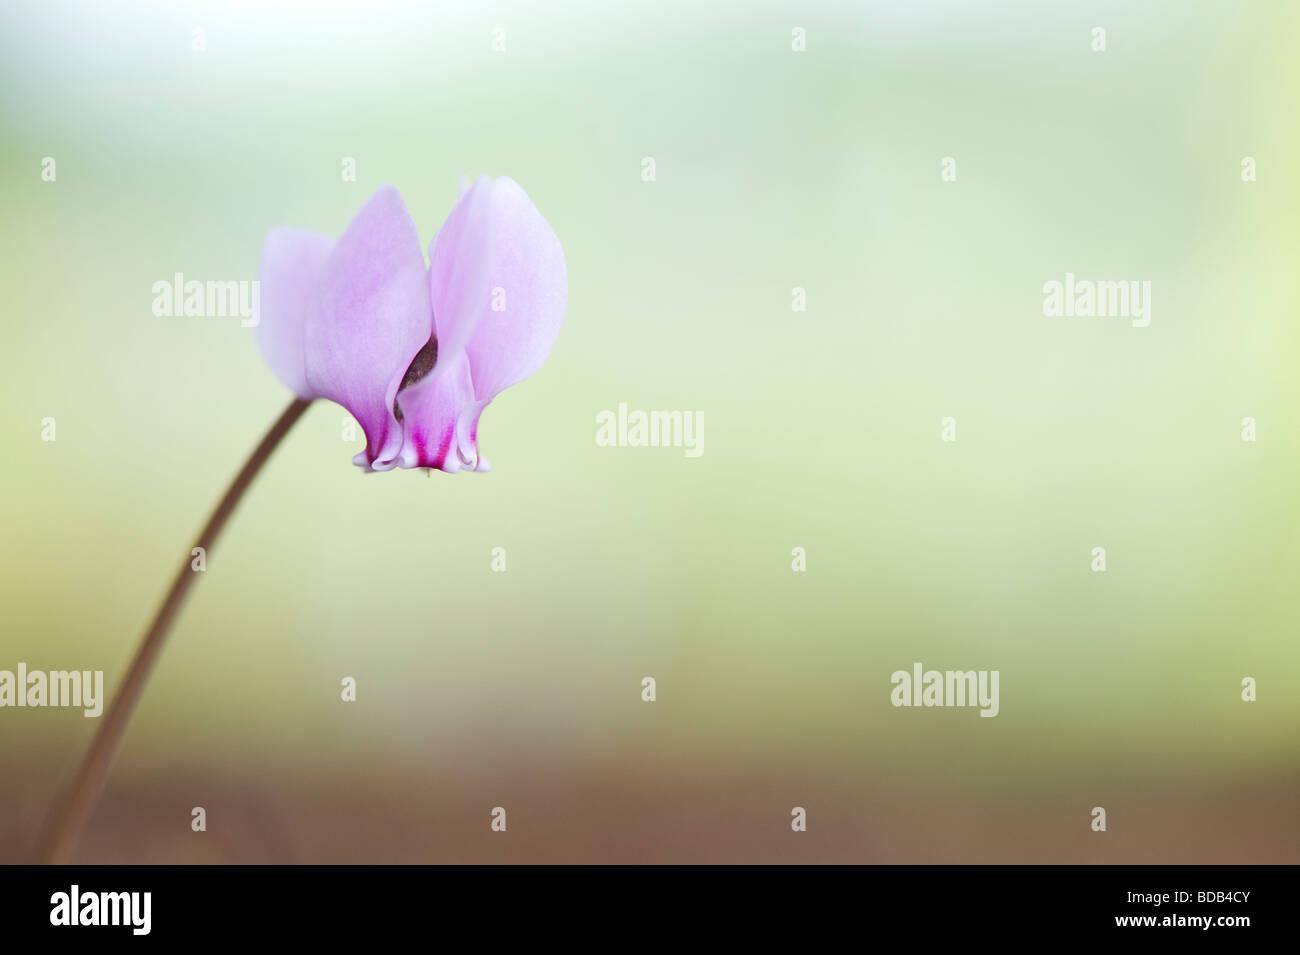 Ciclamino hederifolium fioritura in autunno. Edera-lasciava ciclamino Immagini Stock